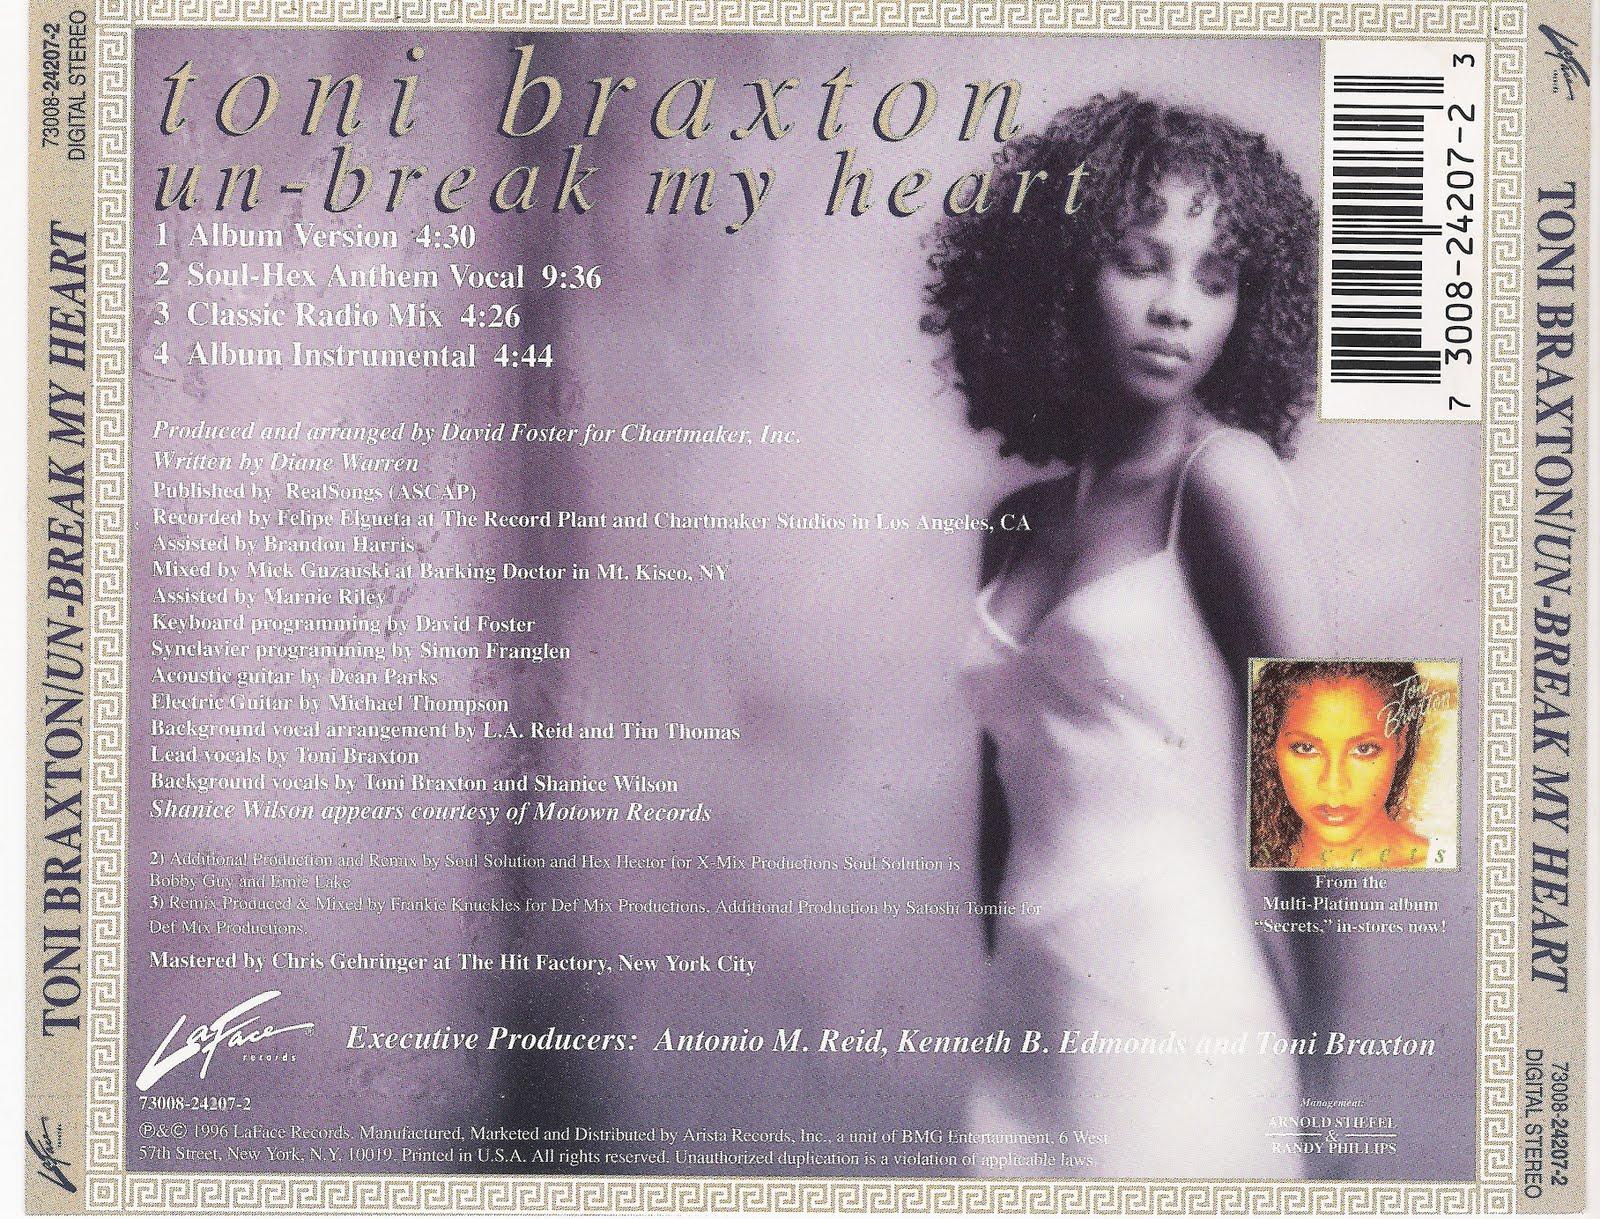 http://1.bp.blogspot.com/-F30ftzZiDwU/TZpFPLdEpSI/AAAAAAAAIx0/Hz96sOH8id4/s1600/00-toni_braxton-un-break_my_heart-%2528cdm%2529-1996-back.jpg